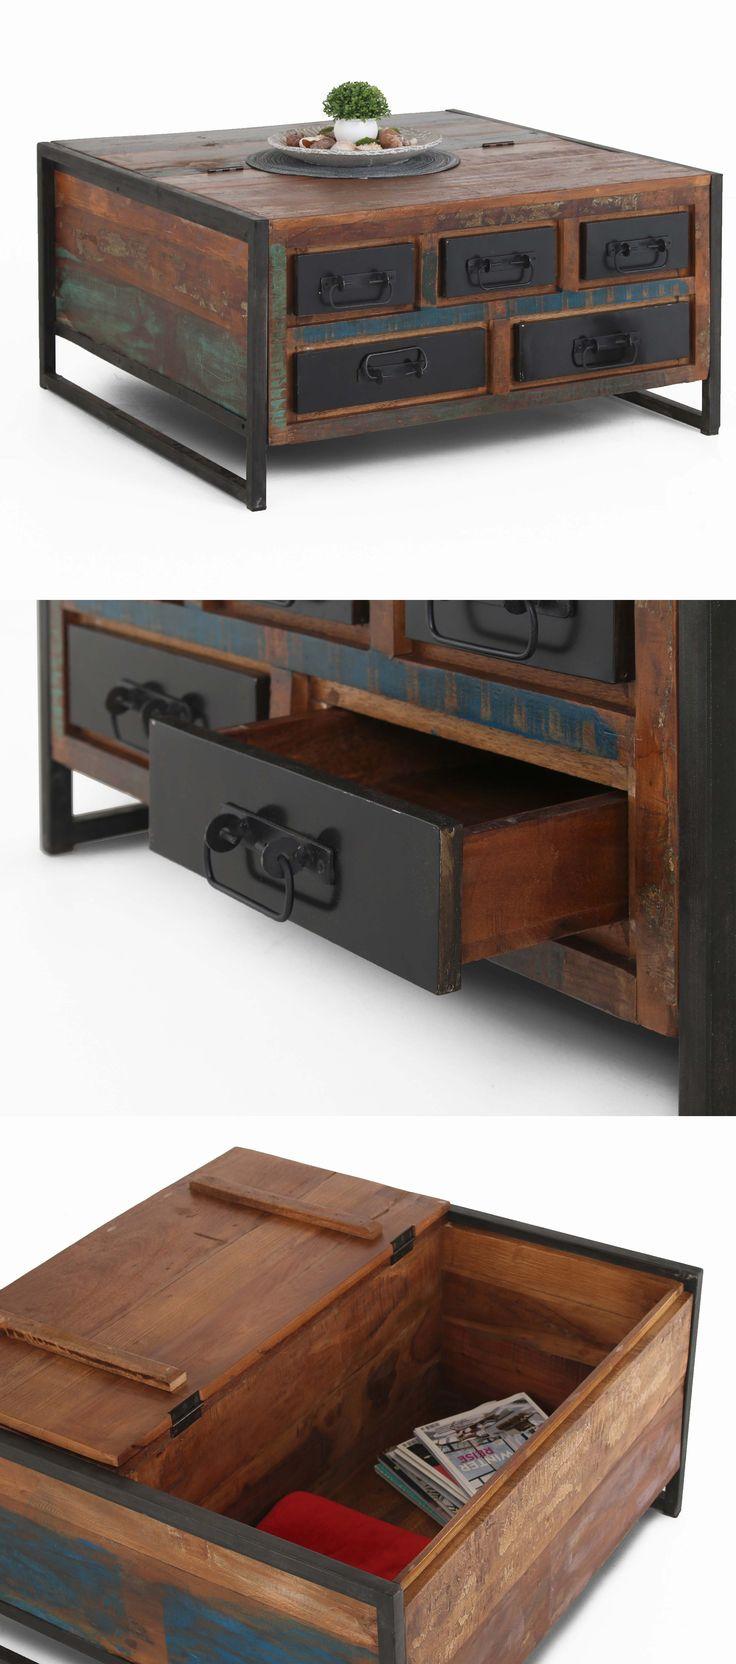 vintage couchtisch bali im shabby chic look begeistert. Black Bedroom Furniture Sets. Home Design Ideas